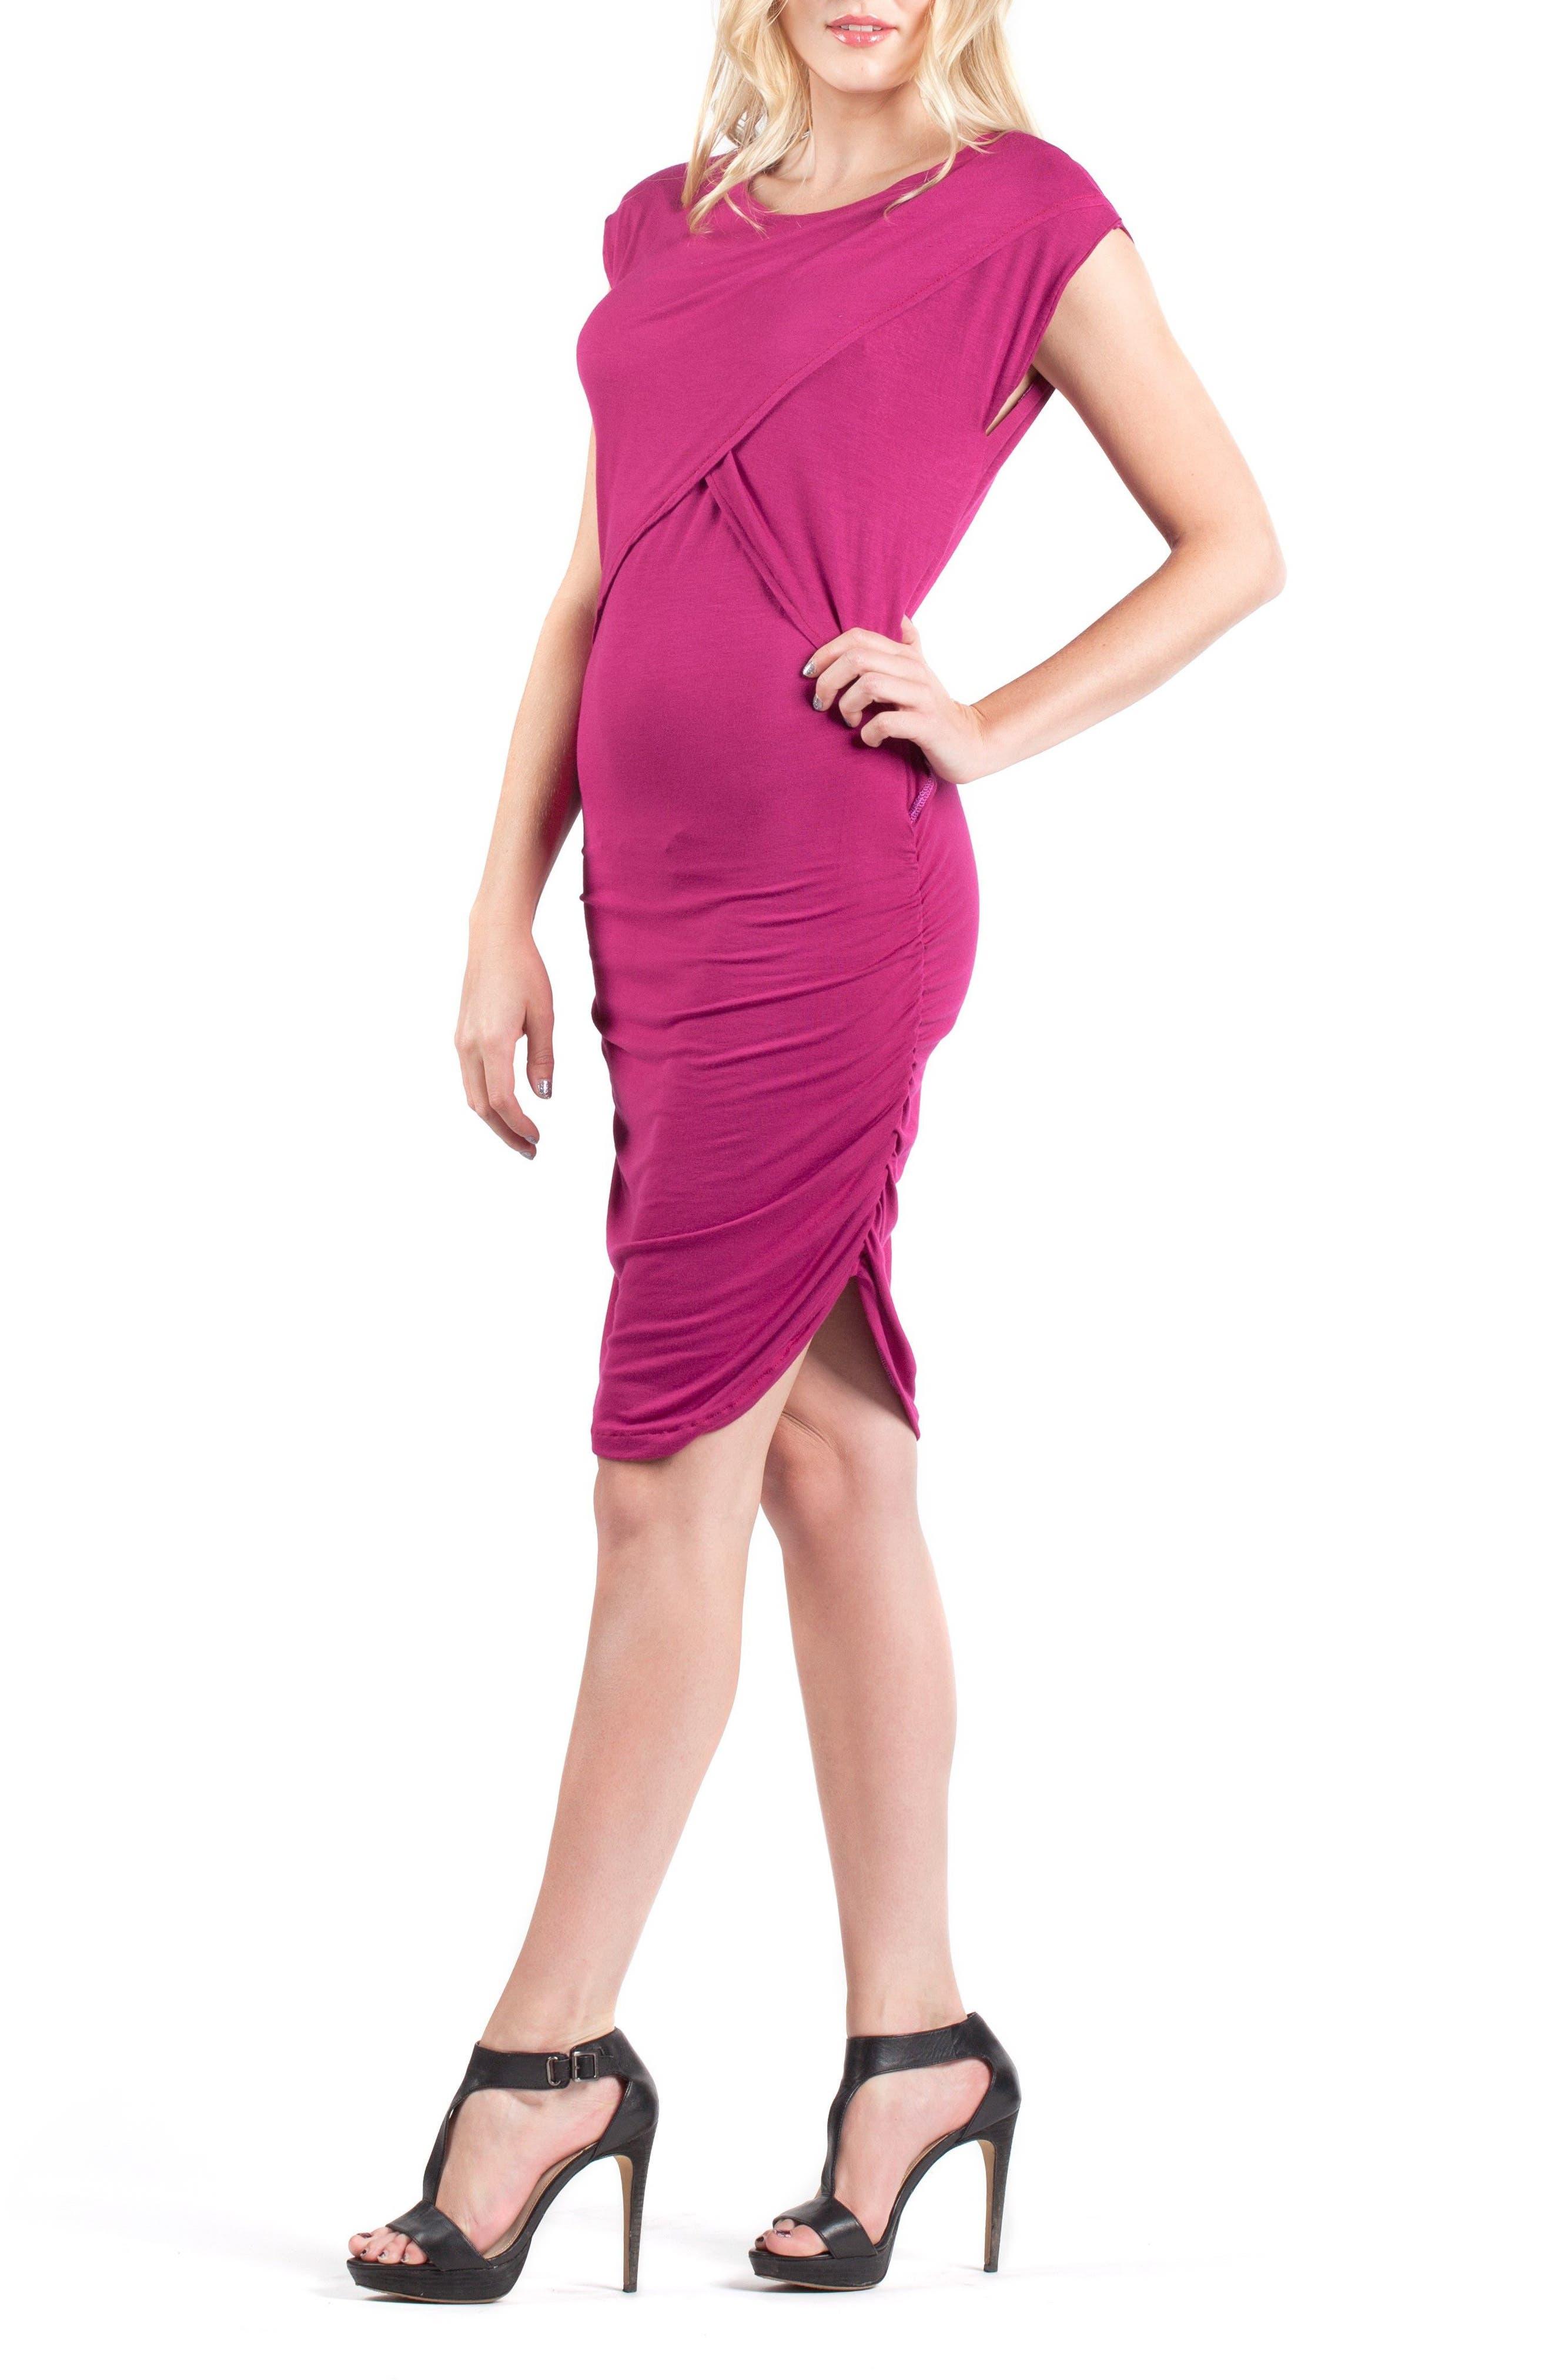 Alternate Image 1 Selected - Savi Mom Miami Crossover Maternity/Nursing Sheath Dress